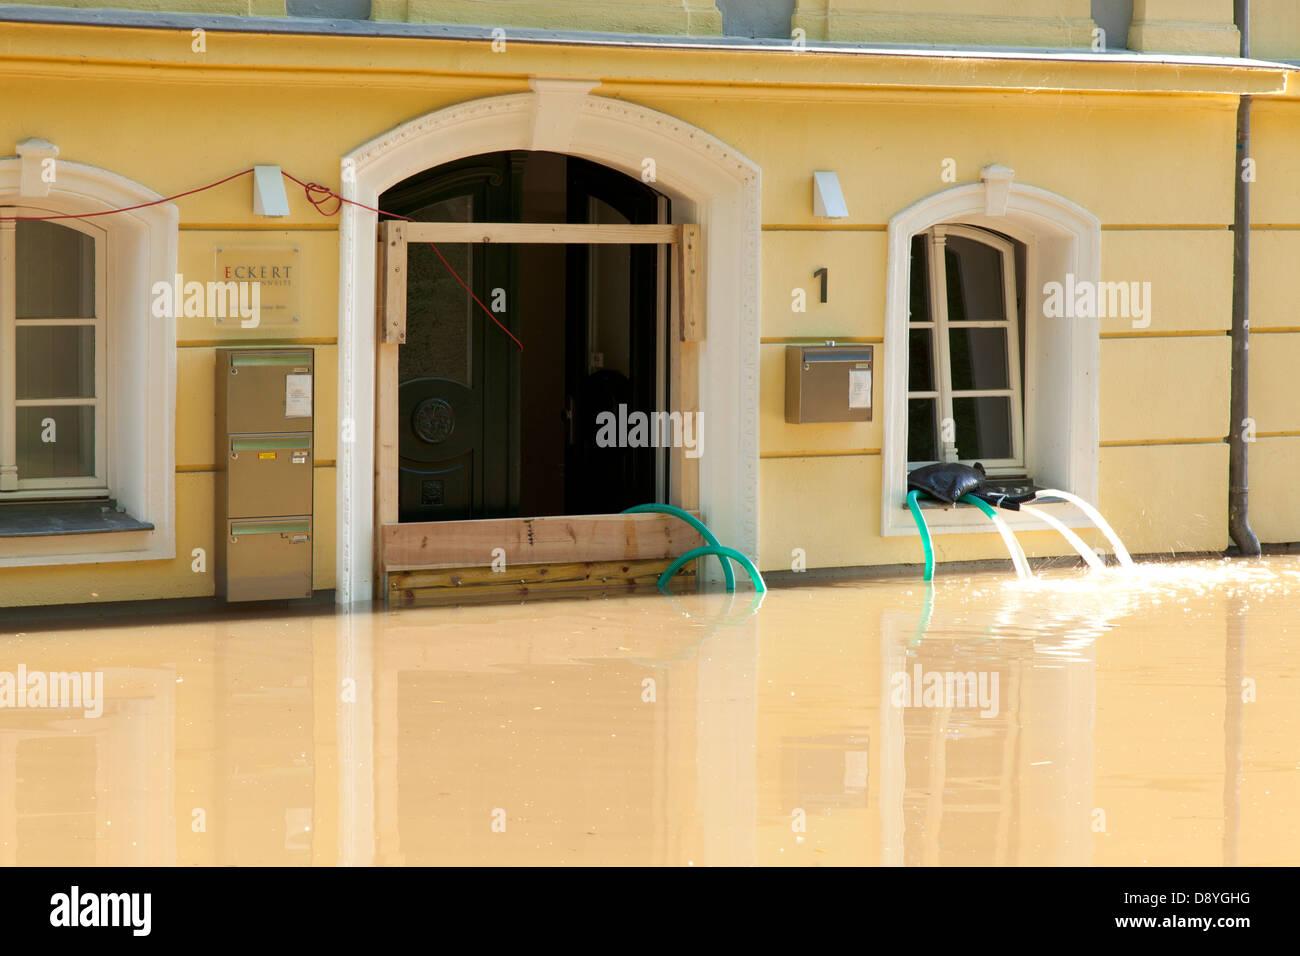 flood of river Saale in Halle, Emil-Eichhorn-Strasse, Germany, 05. June 2013; Hochwasser in Halle (Saale) - Stock Image